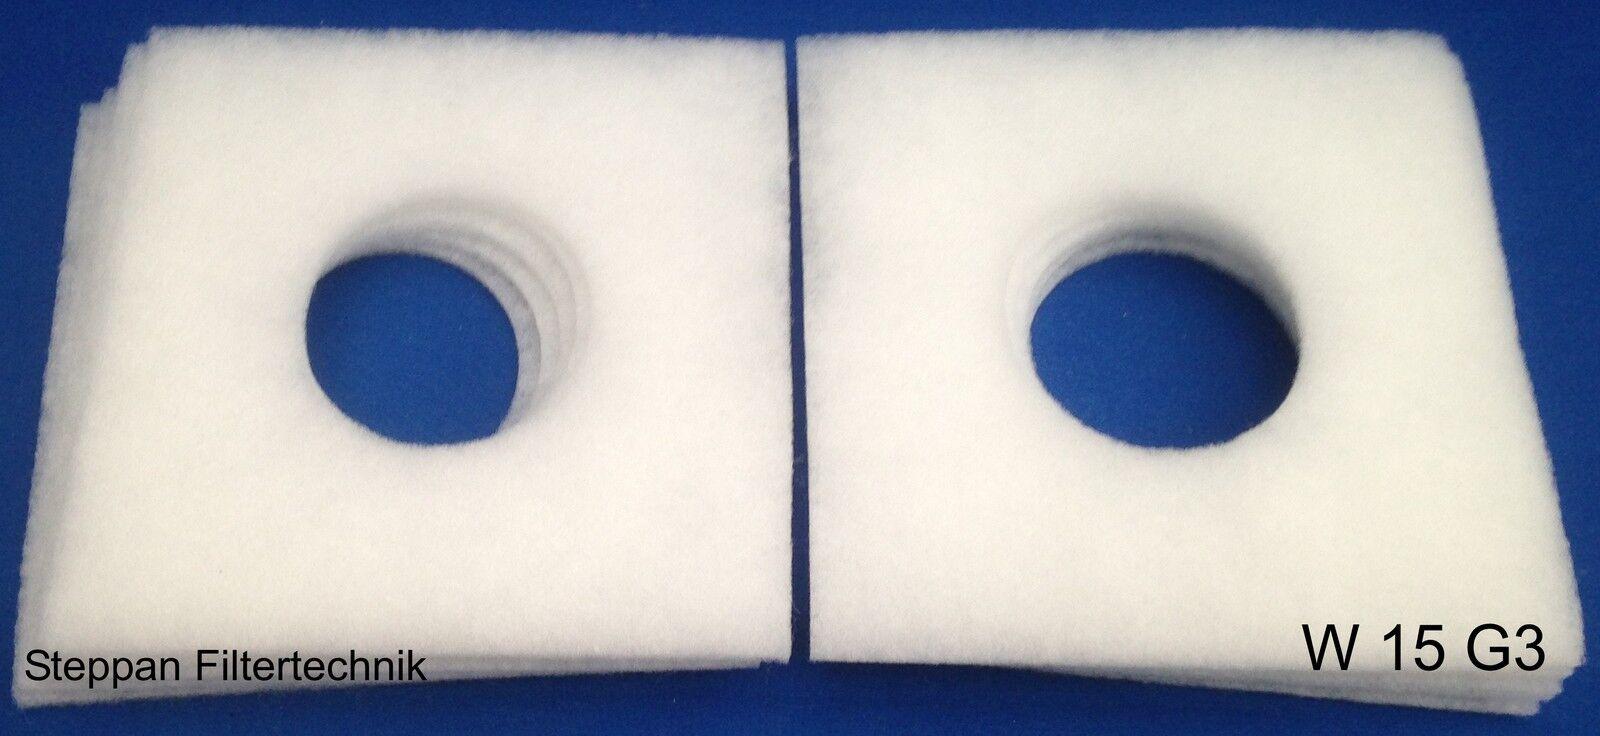 50 50 50 x Ersatzfilter 238 x 238 mm Staubfilter für Limodor Limot Lüfter Compact     | Großhandel  | Up-to-date-styling  | Online Outlet Store  dda961